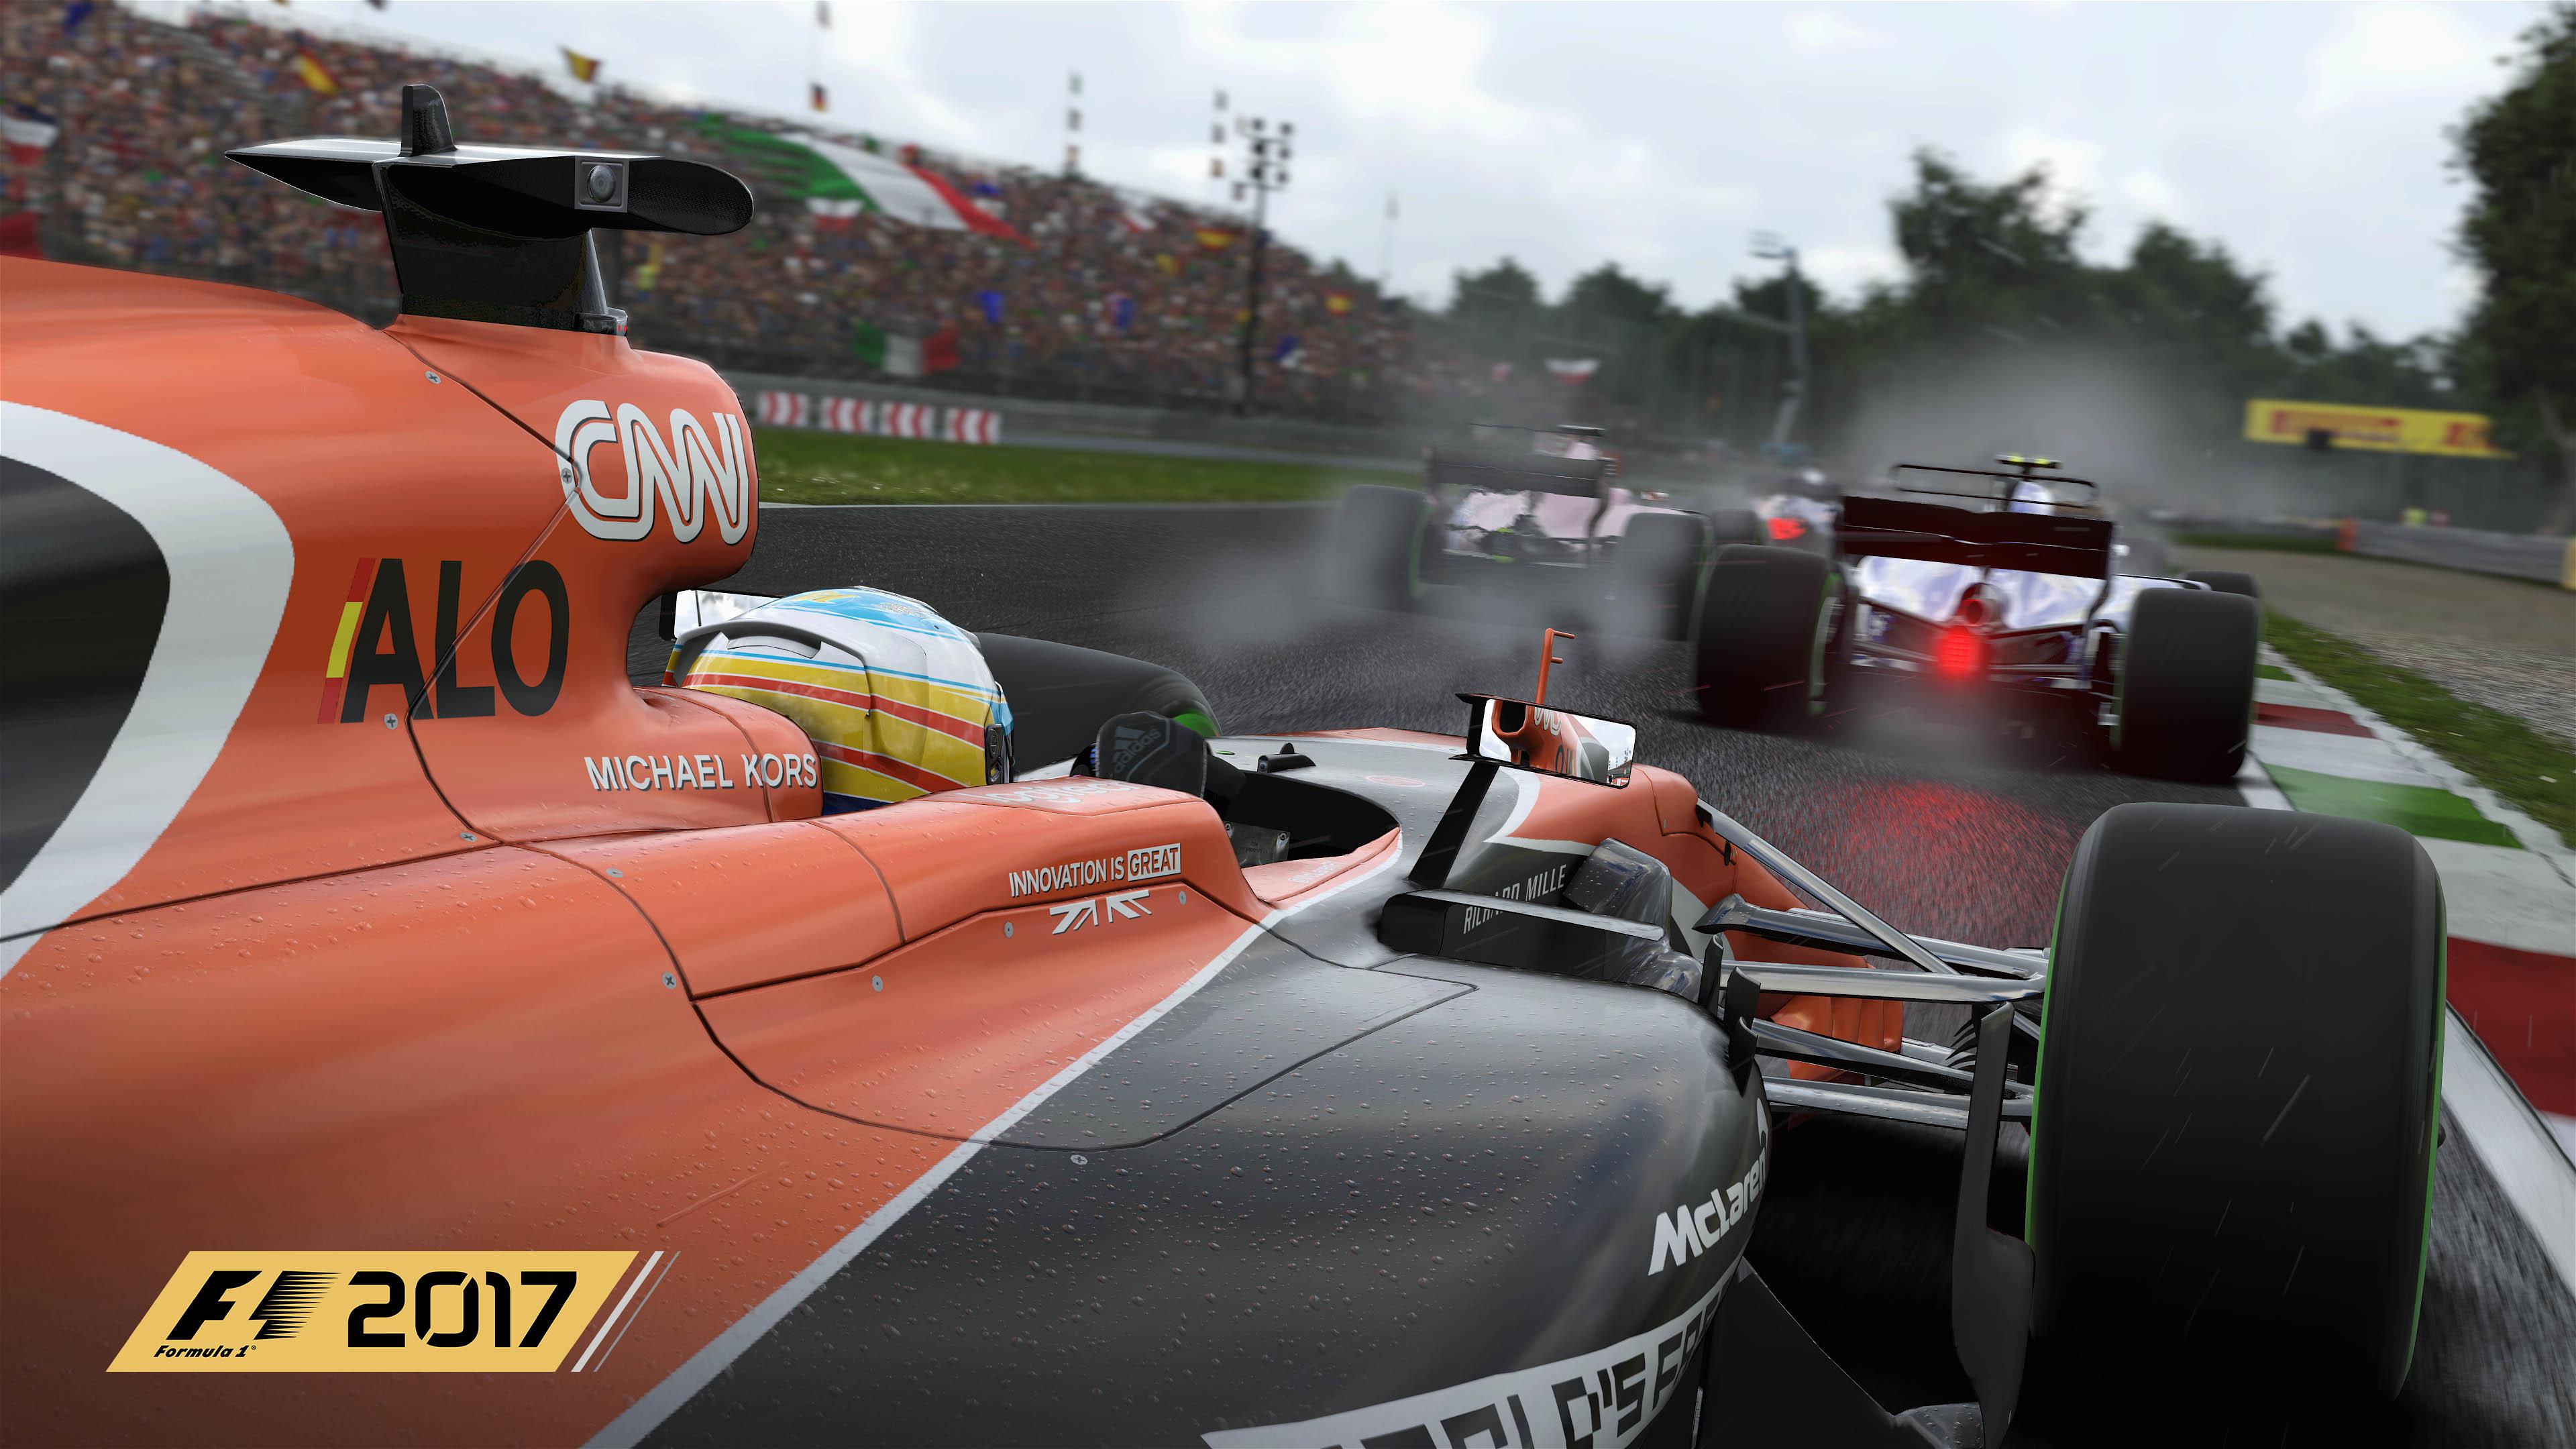 F1 2017 new liveries 7